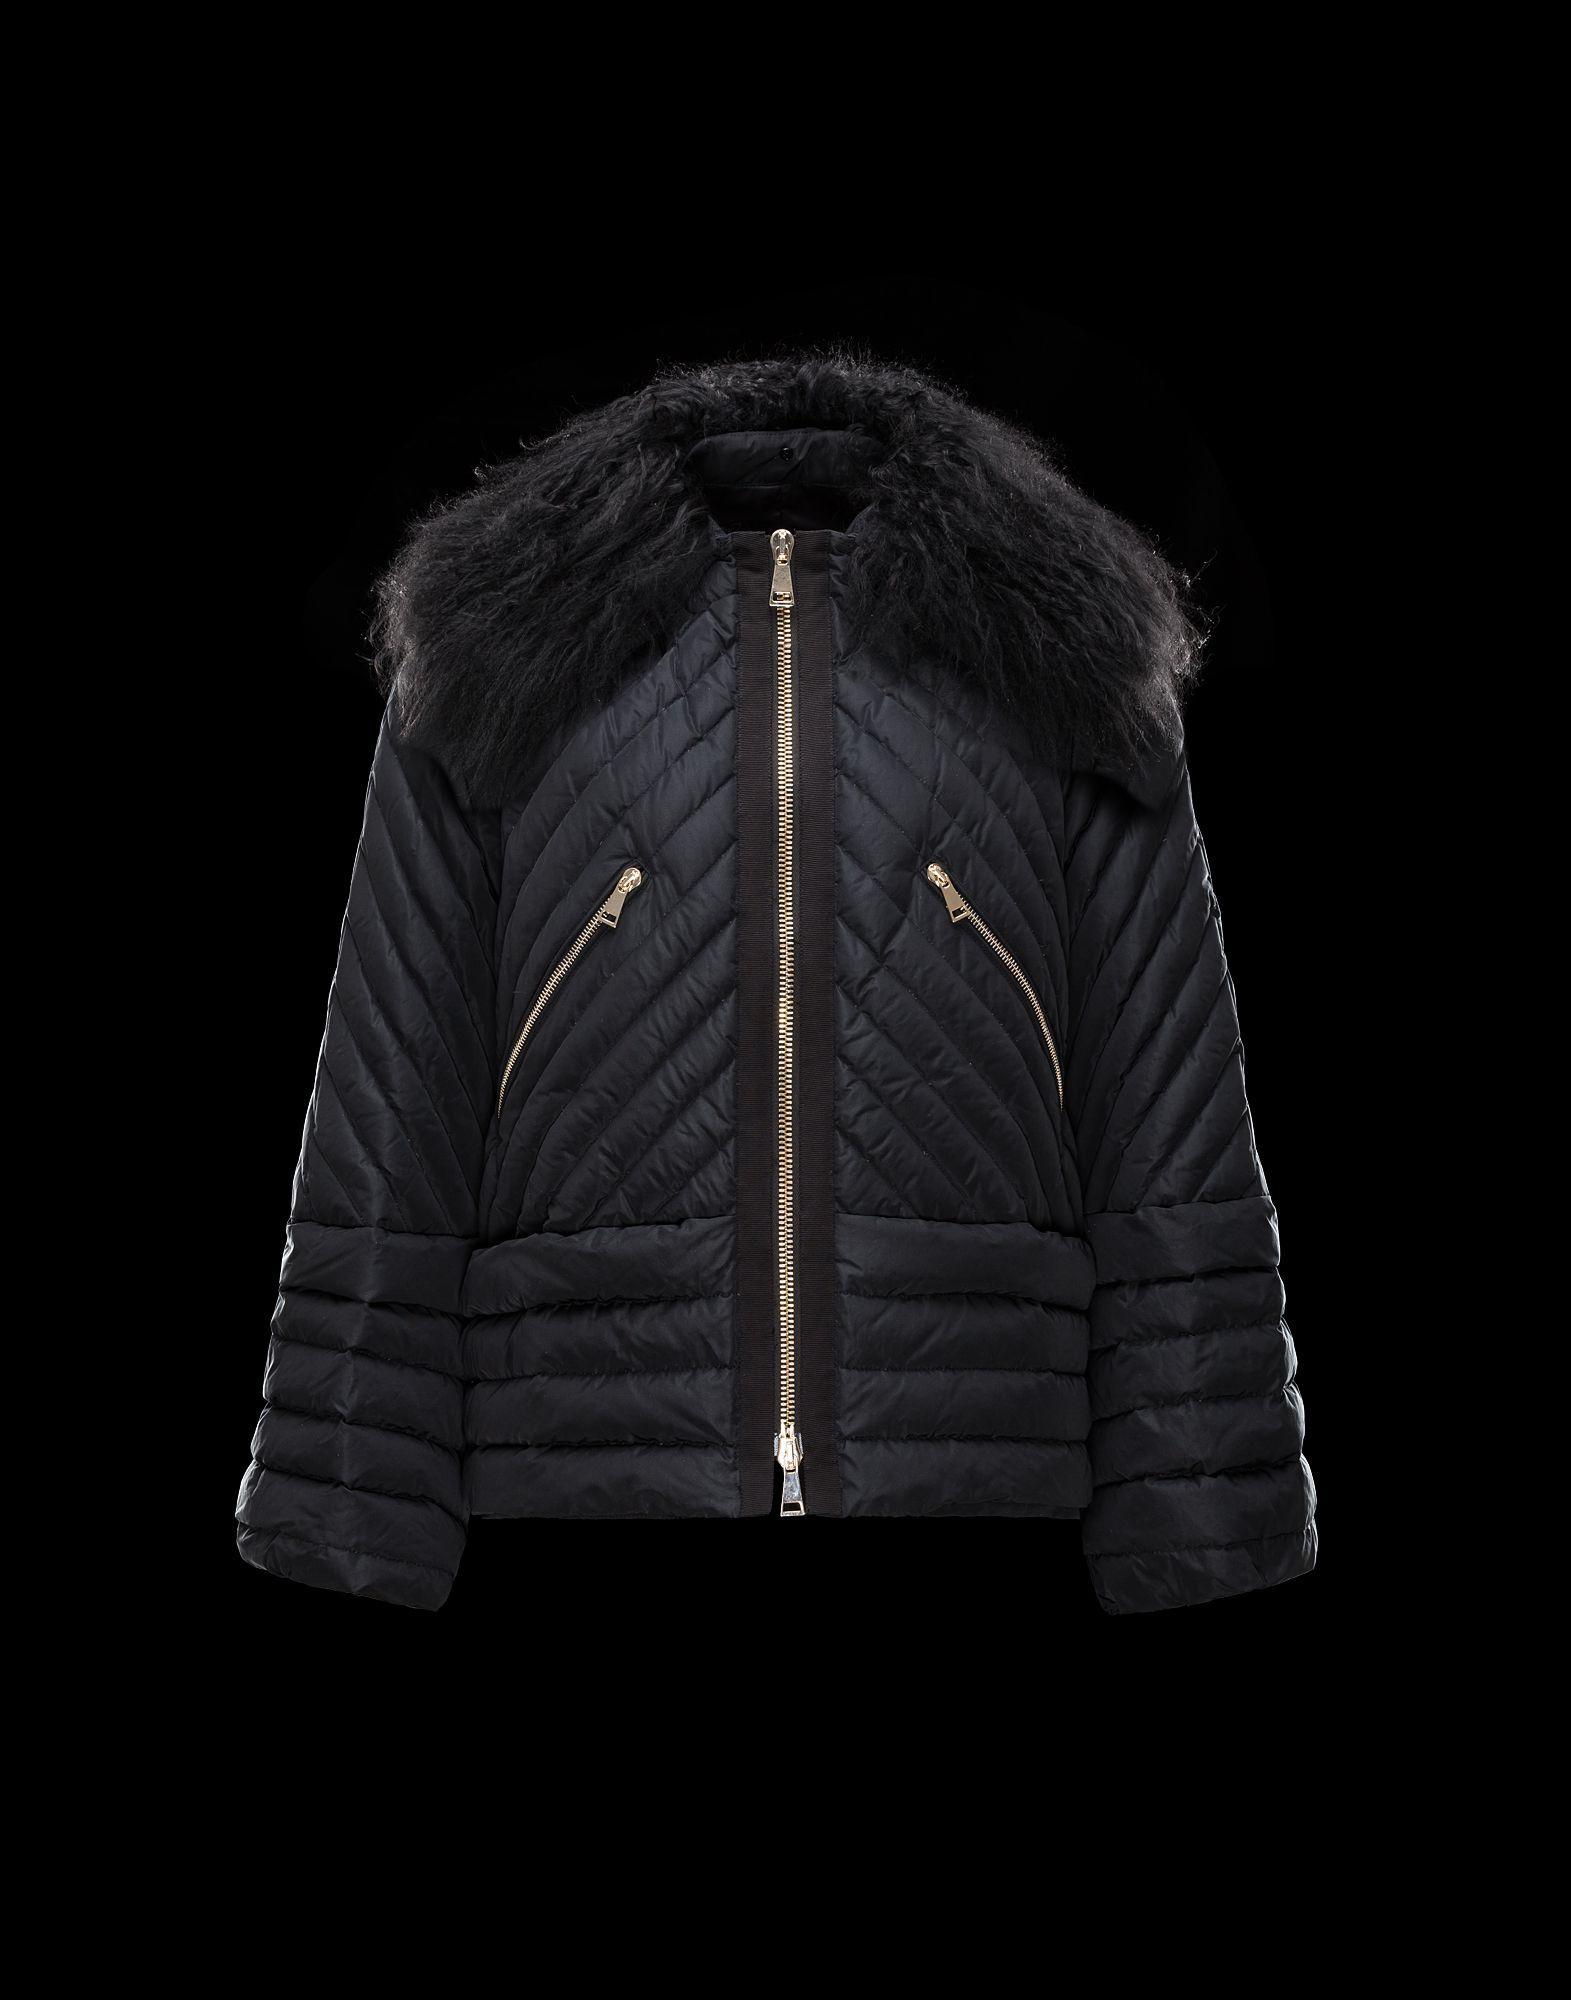 new product 18126 43d3e Jacket Women - Outerwear Women on Moncler Online Store ...